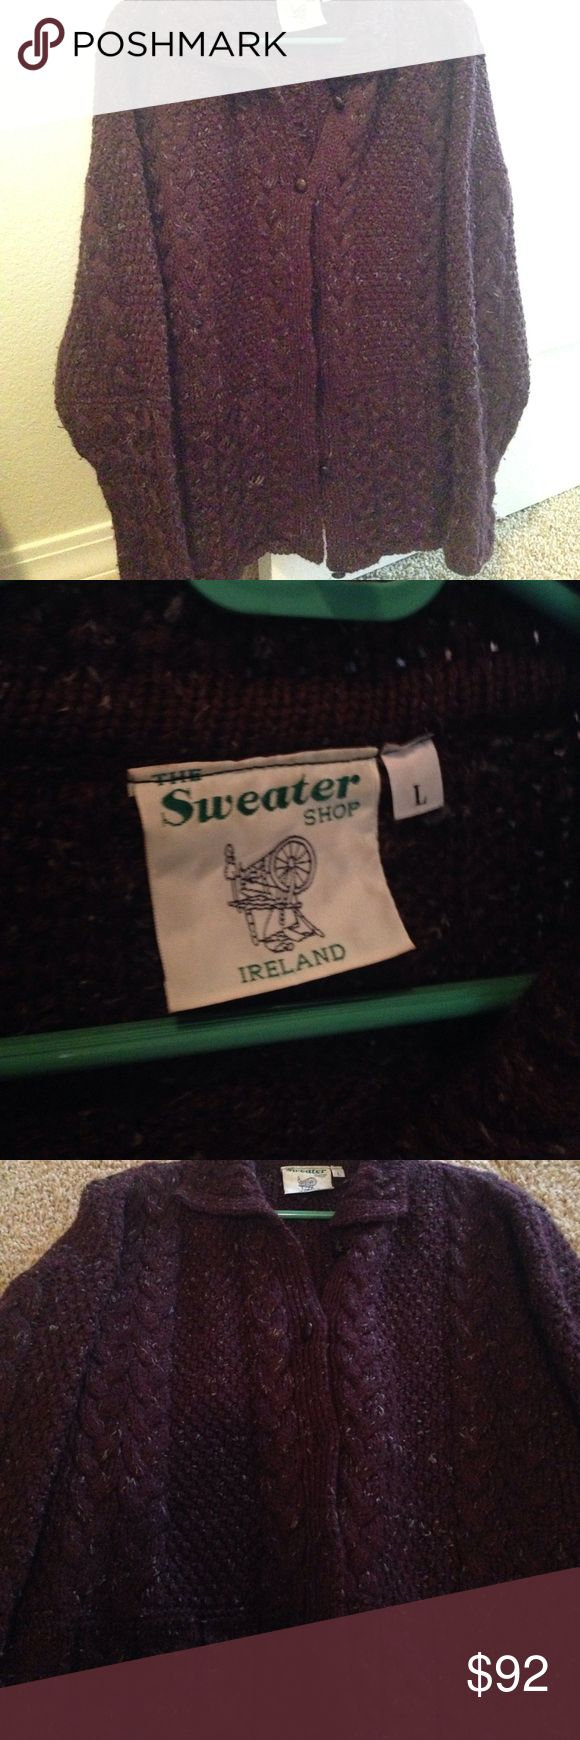 Stunning hand knit Irish sweater Heavy, warm sweater from Ireland sweater shop Sweaters Cardigans